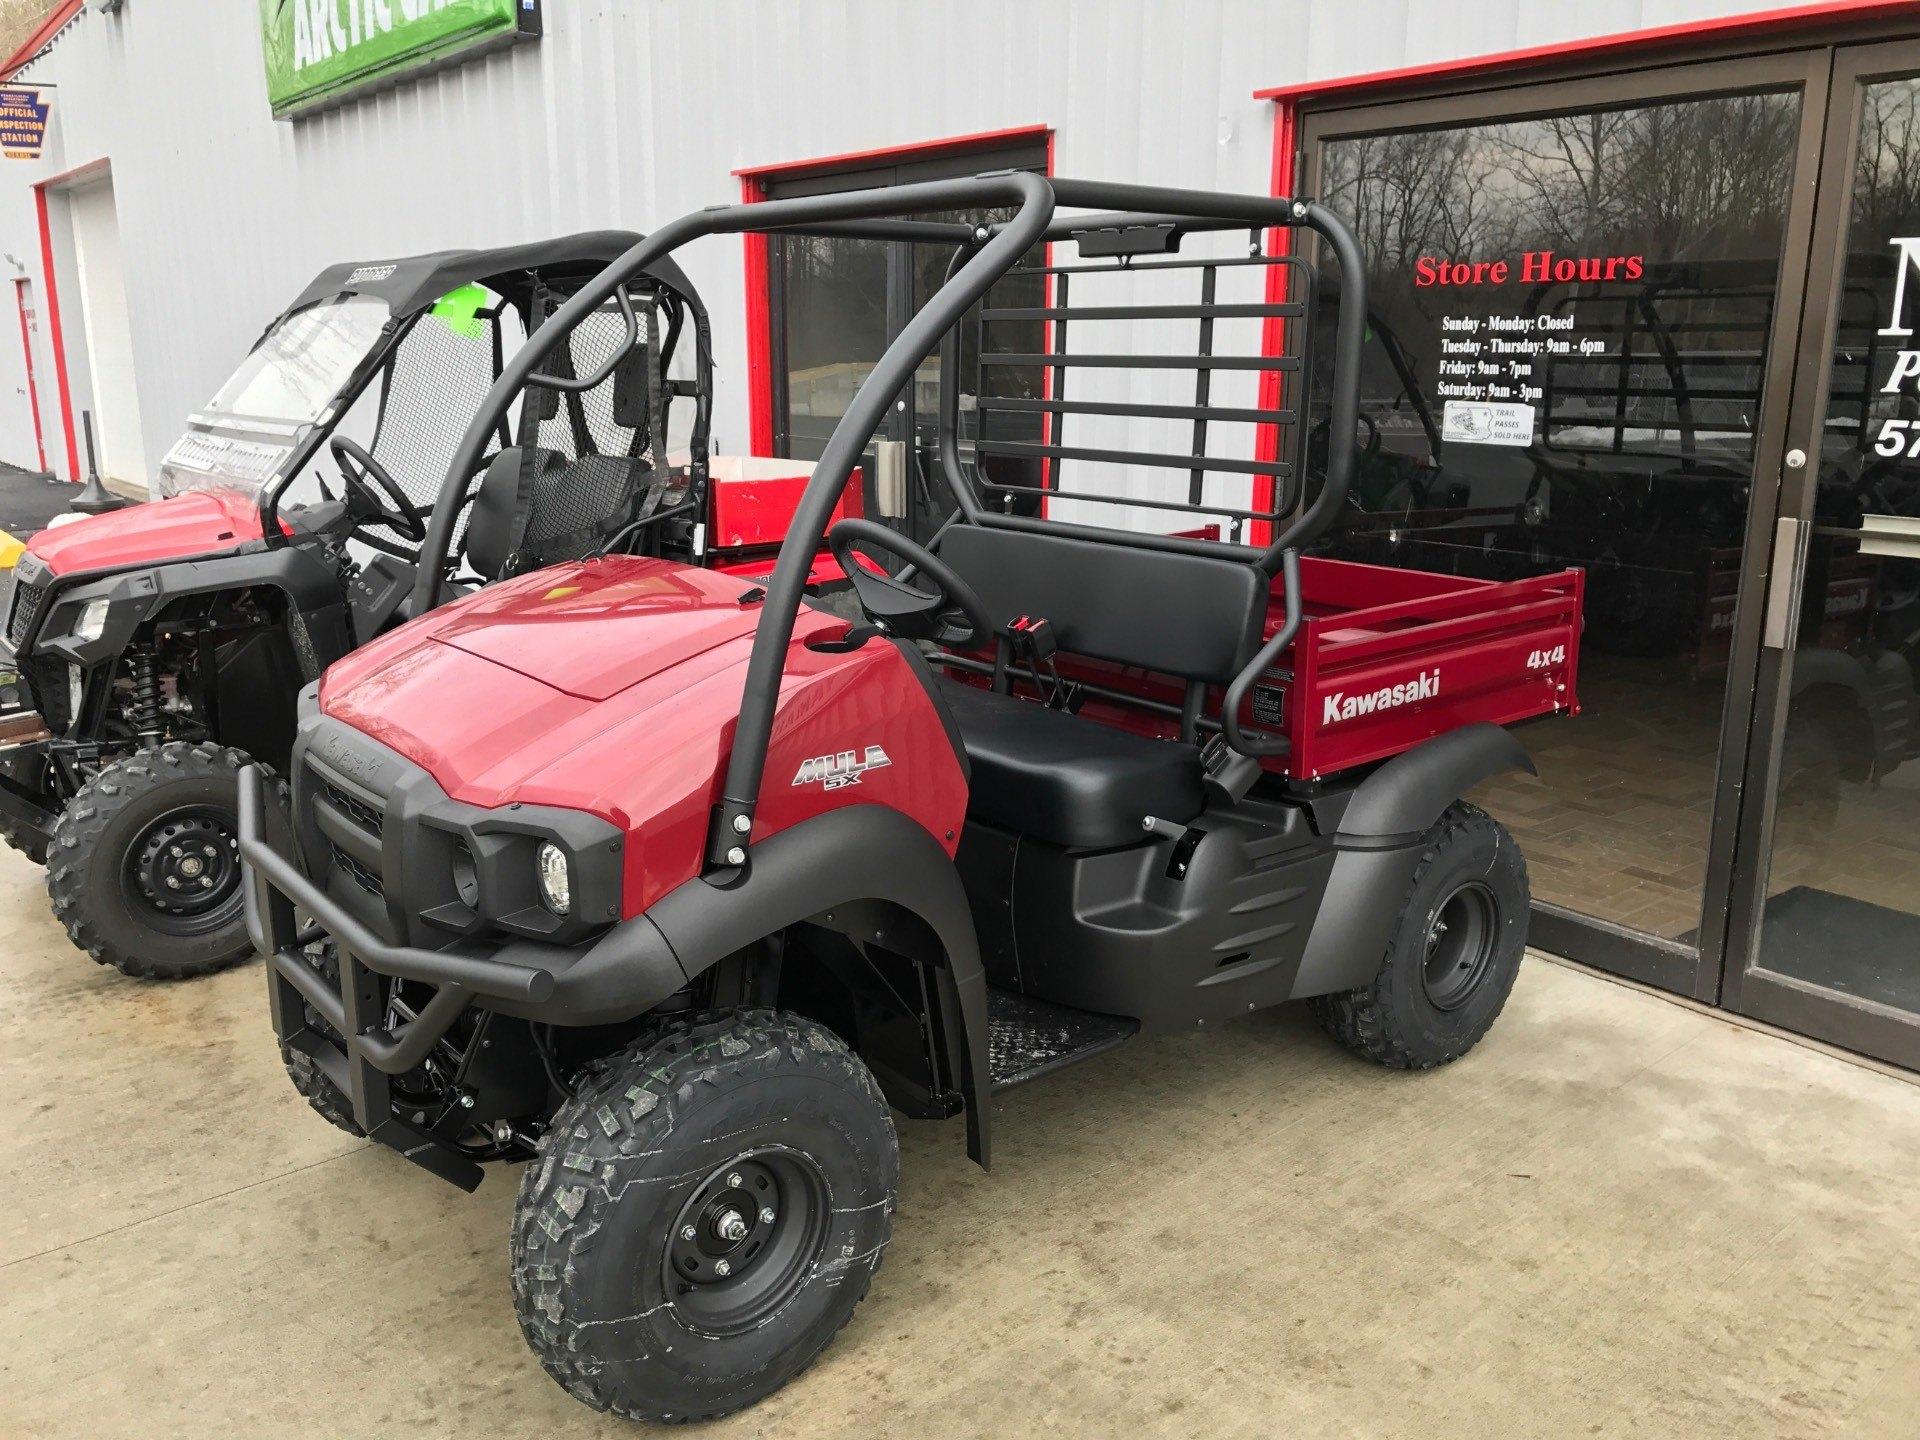 2017 Kawasaki MULE for sale 2603